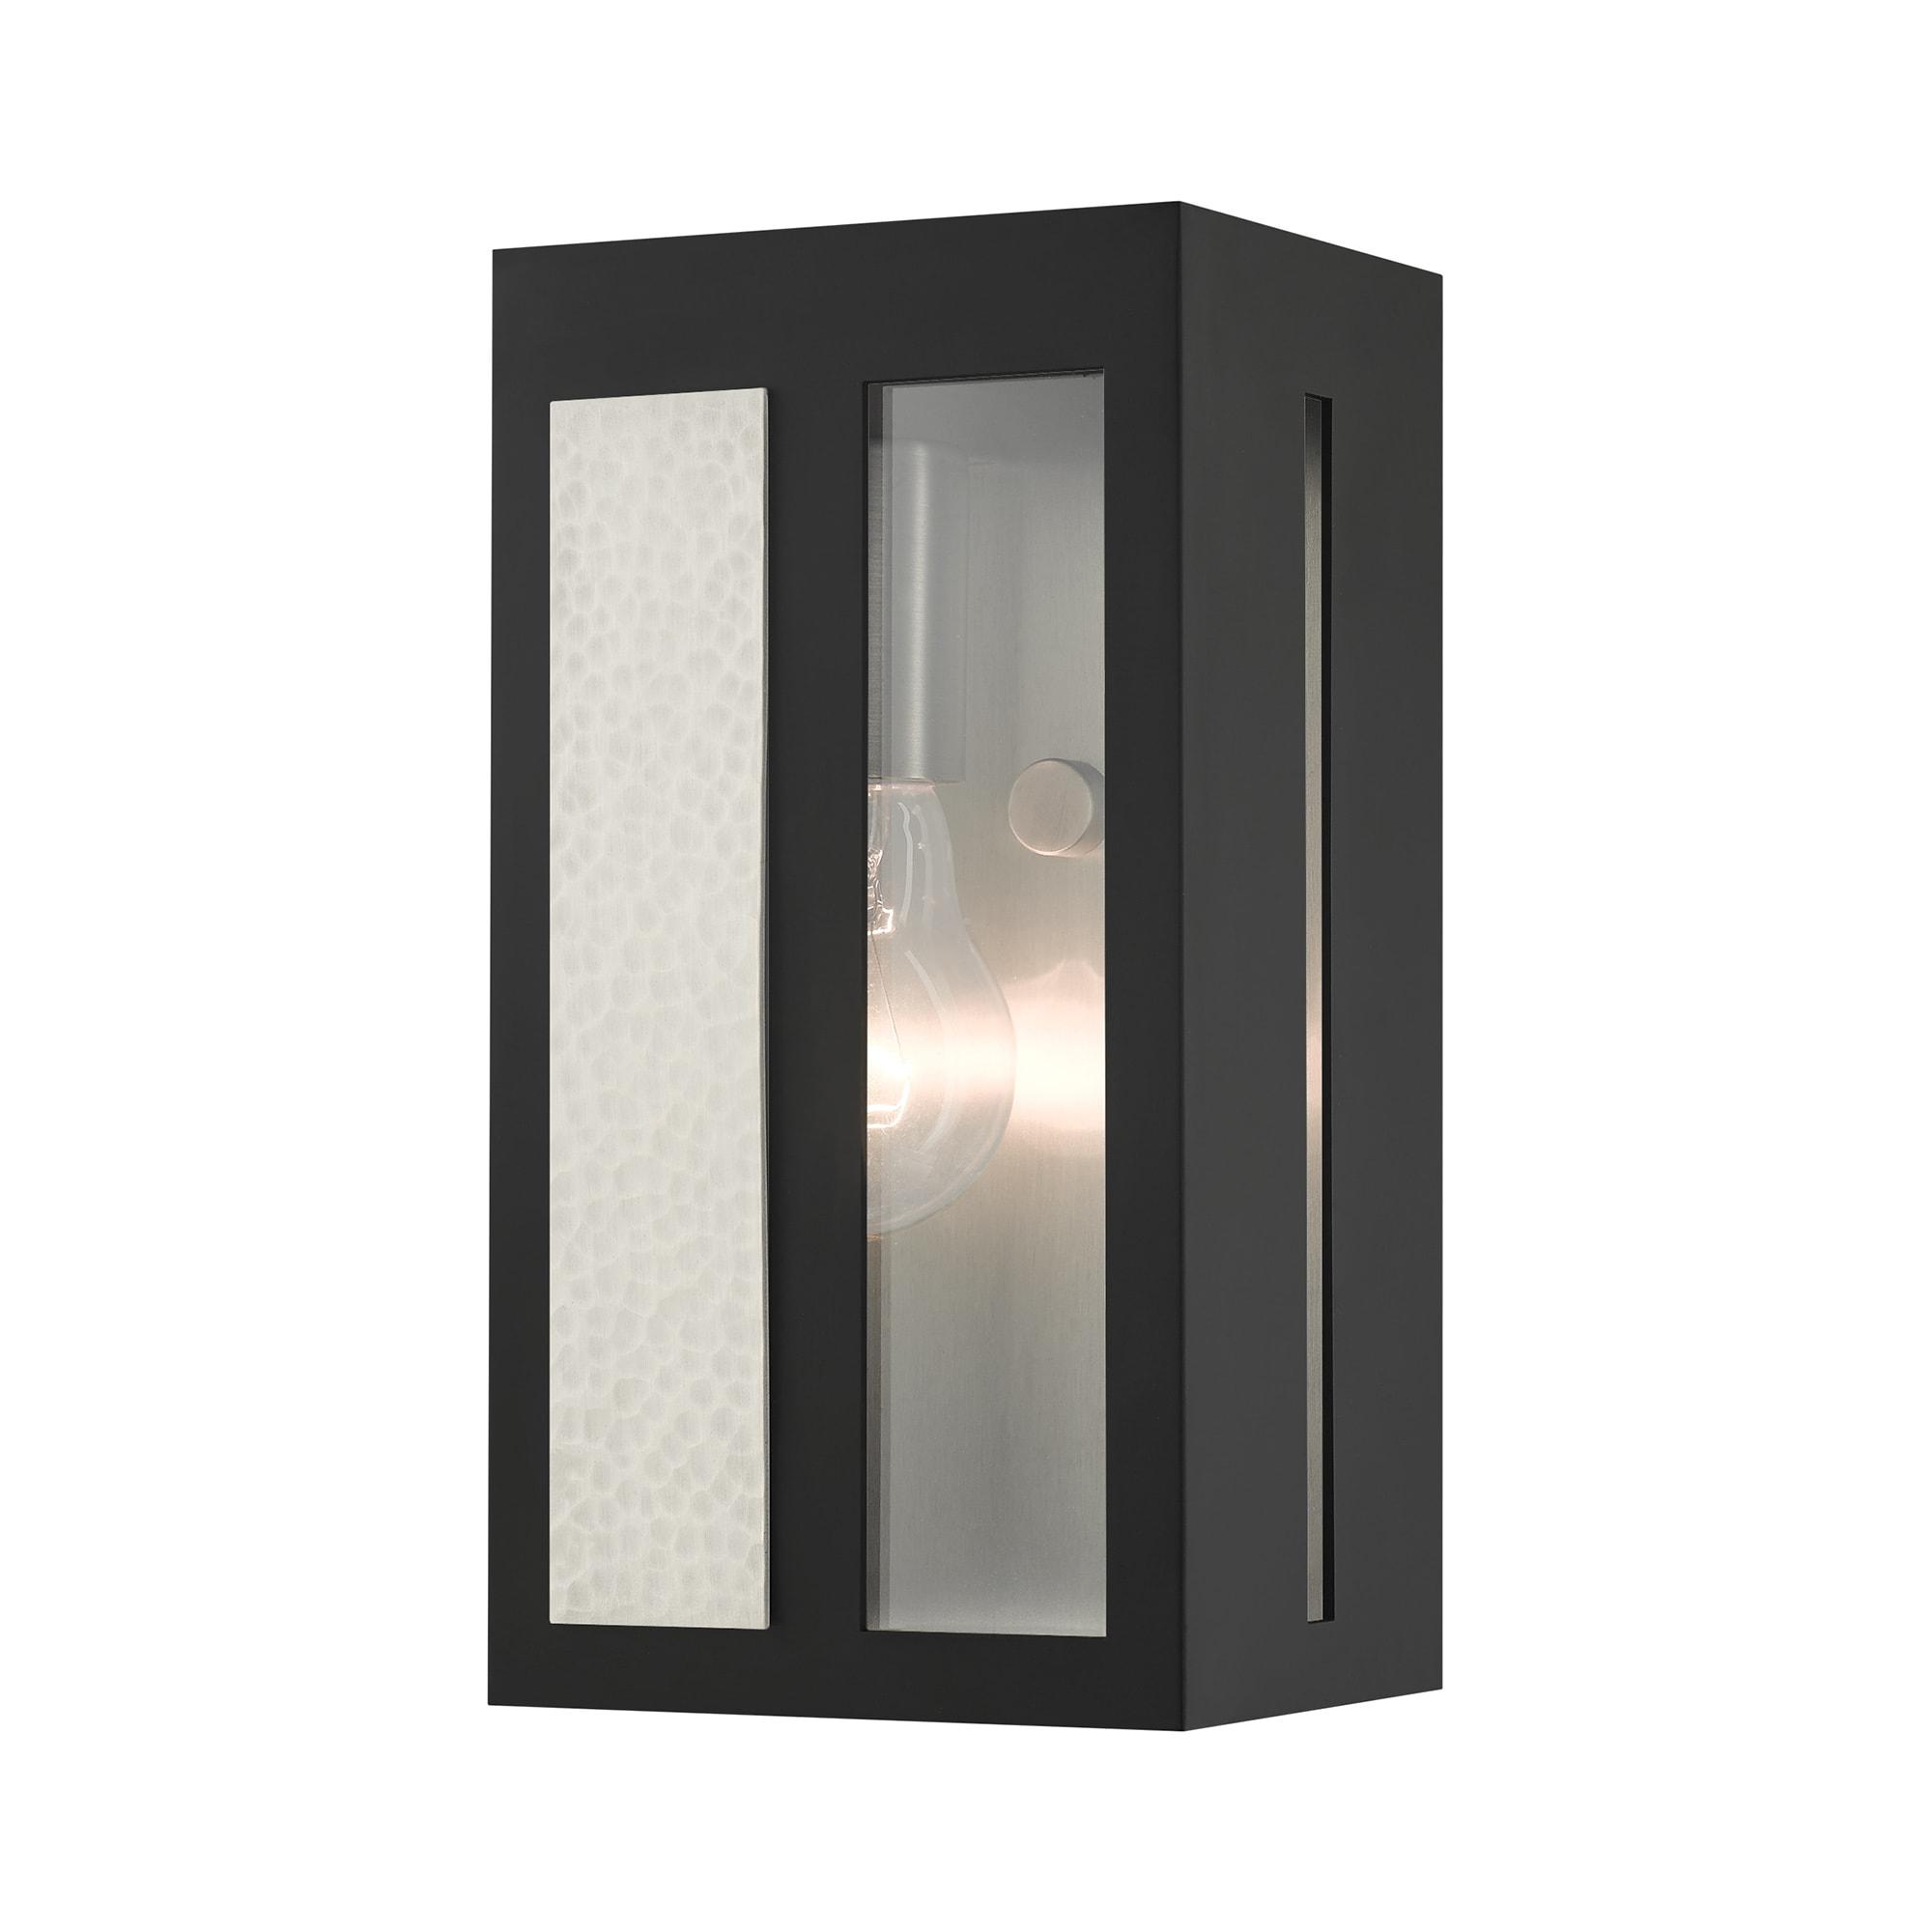 Livex Lighting 27411 04 Black Lafayette 9 Tall Outdoor Wall Sconce Lightingdirect Com